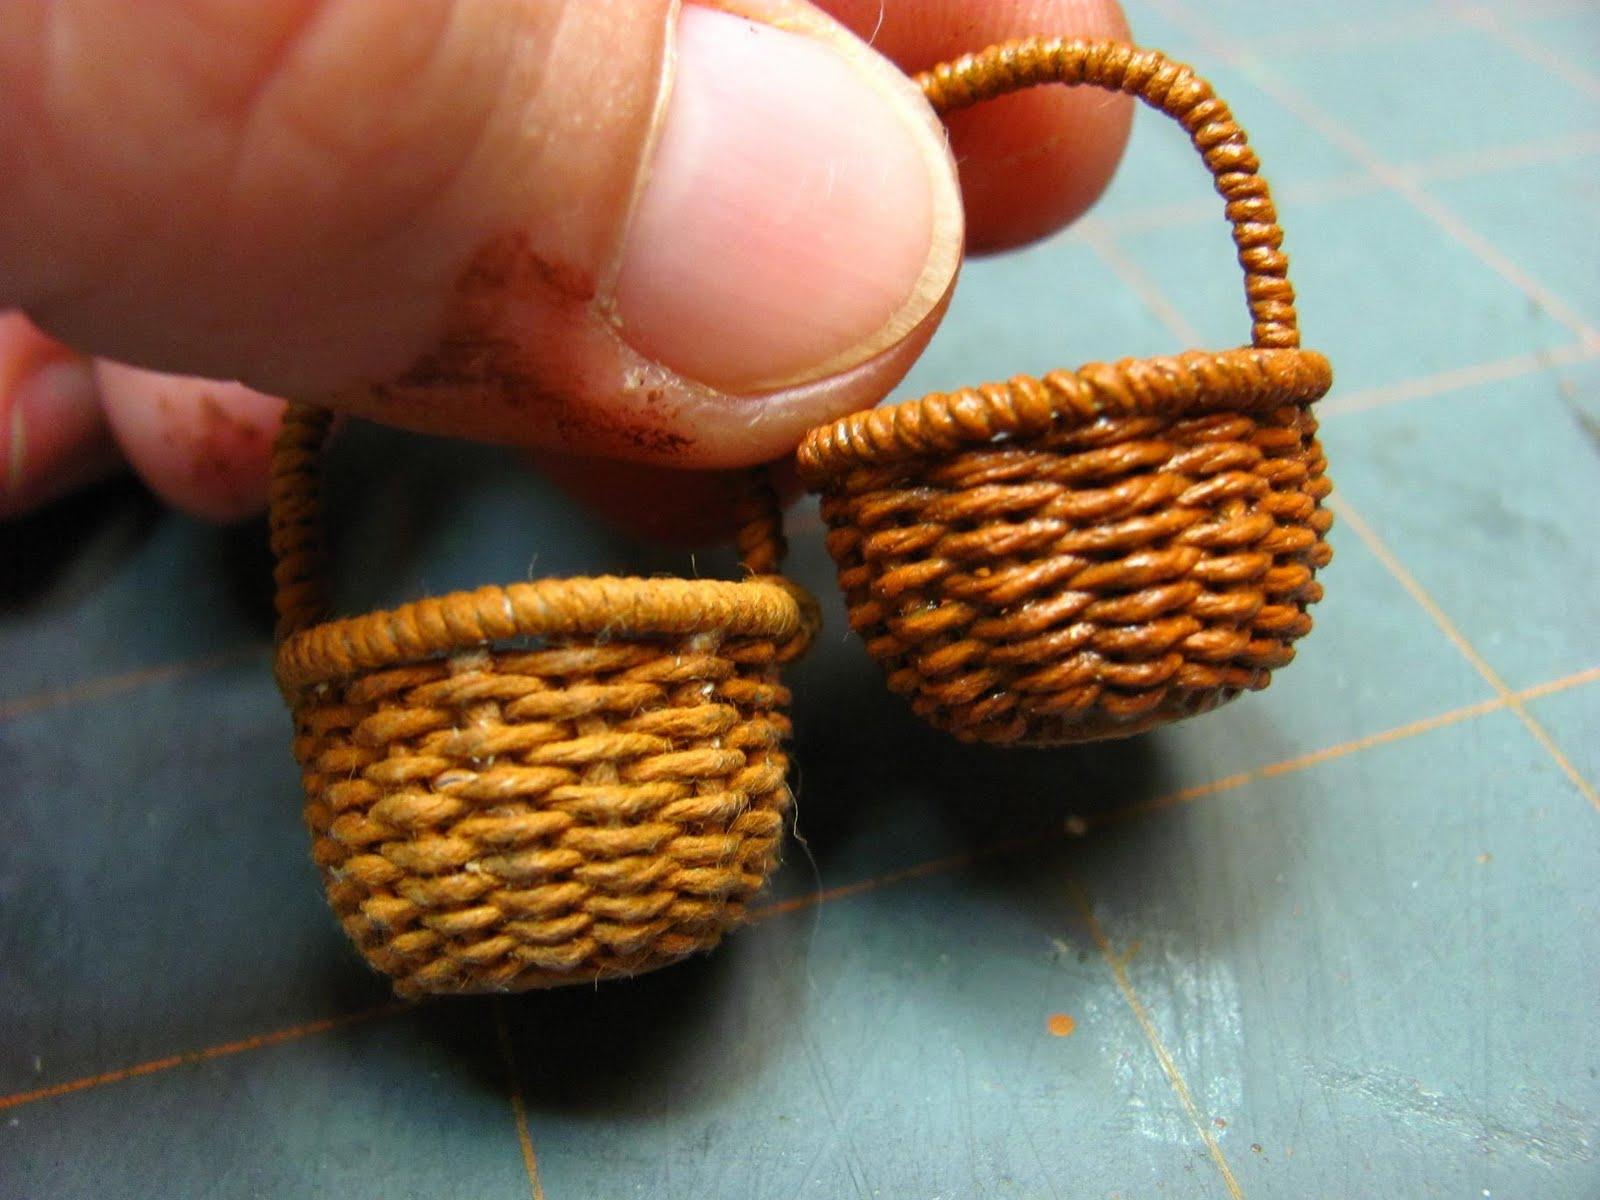 Basket Weave Tutorial Crochet : Dollhouse miniature furniture tutorials inch minis